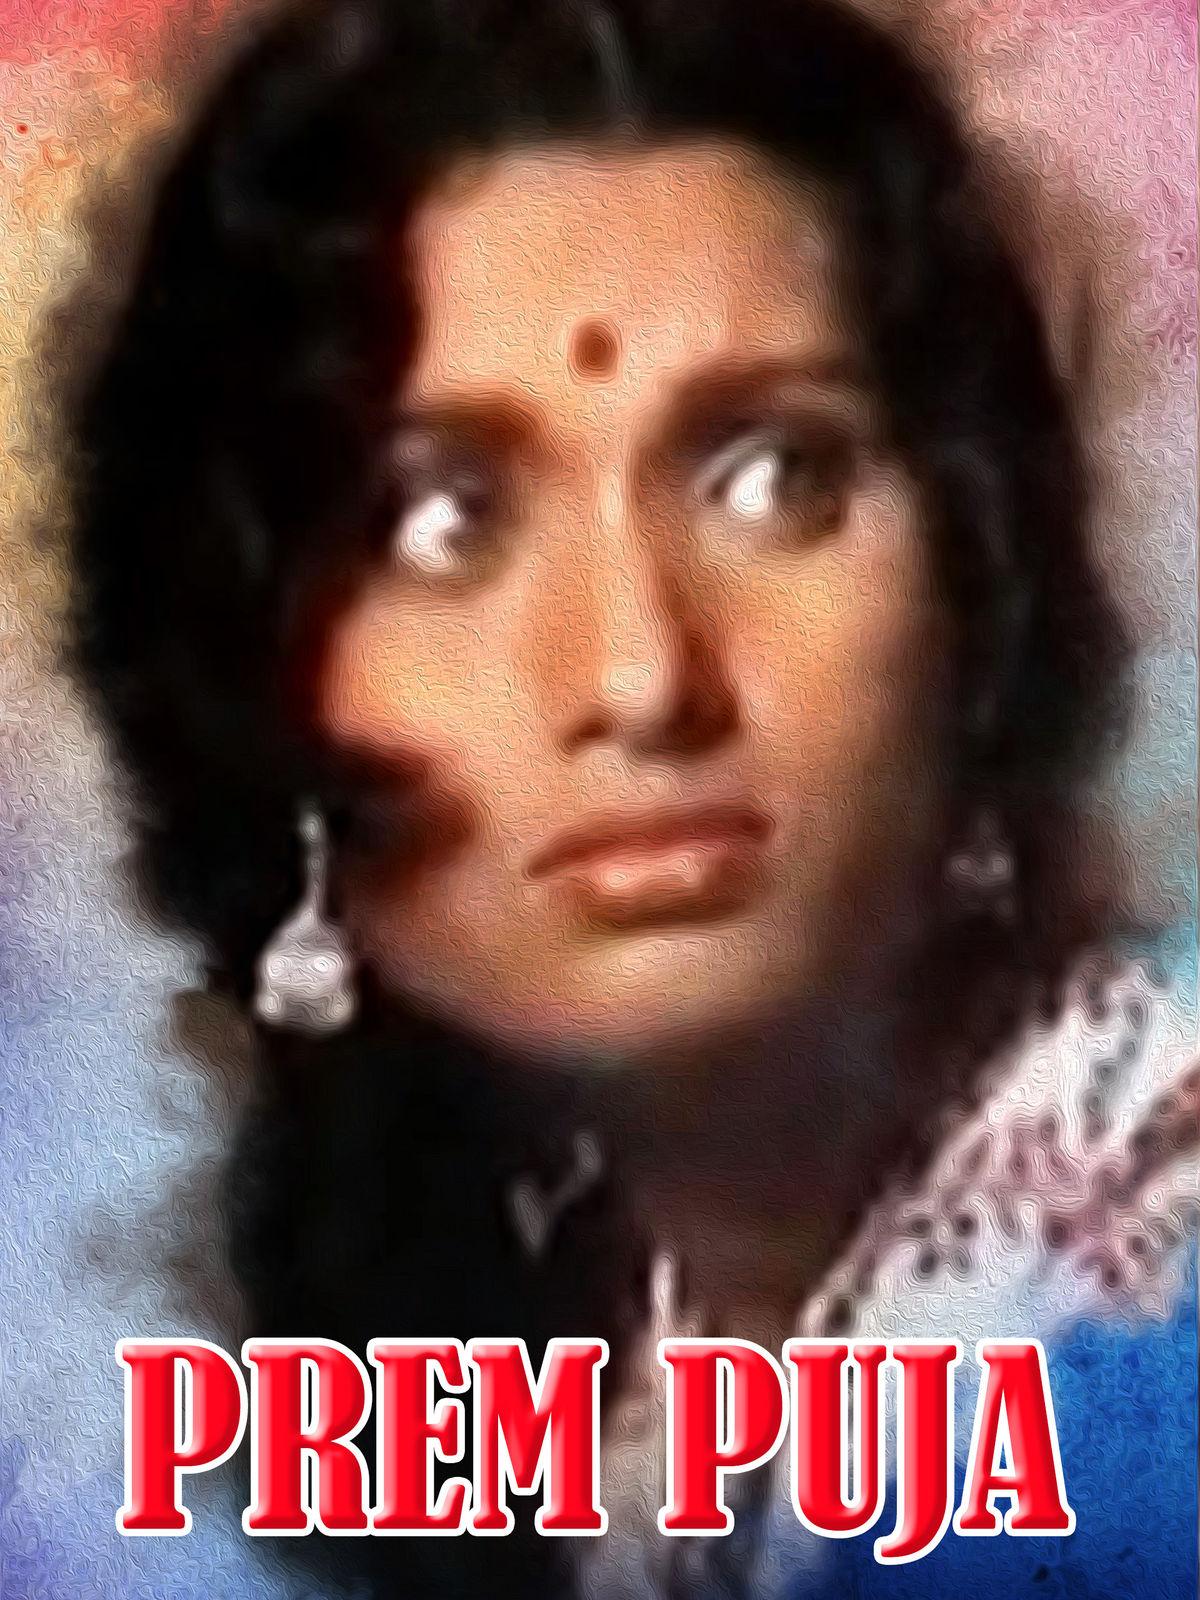 Kunal Dutta Best Movies, TV Shows and Web Series List